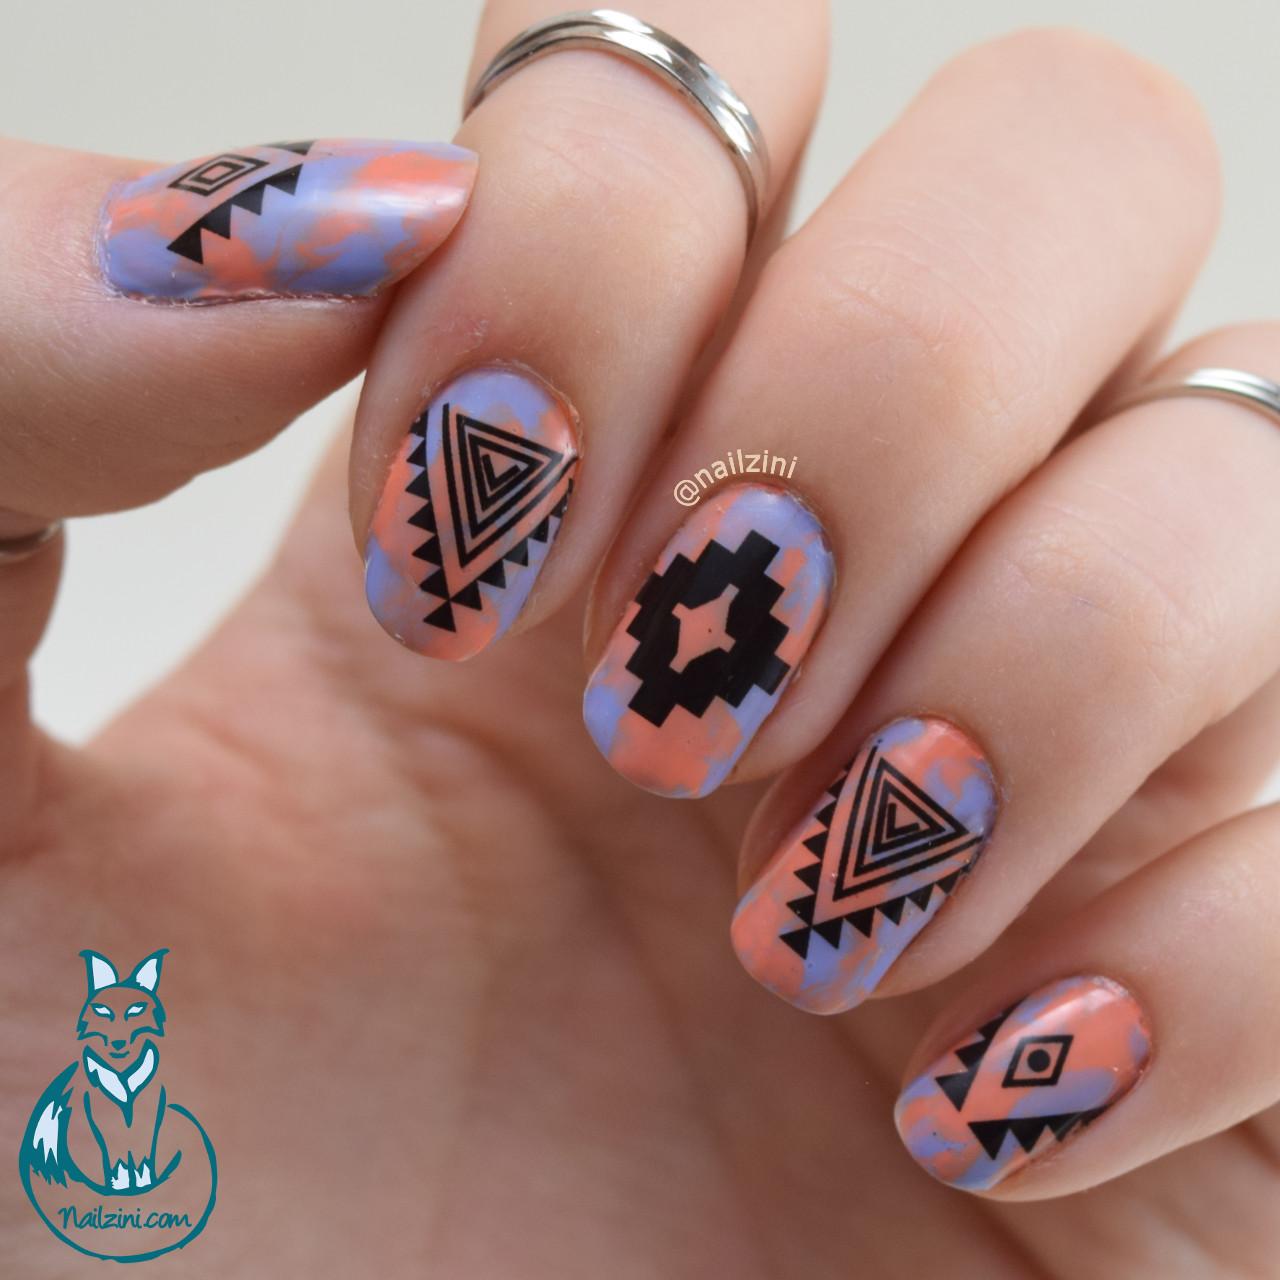 Nailzini A Nail Art Blog: Dry Marble Tribal Nail Art -- Born Pretty Store Review